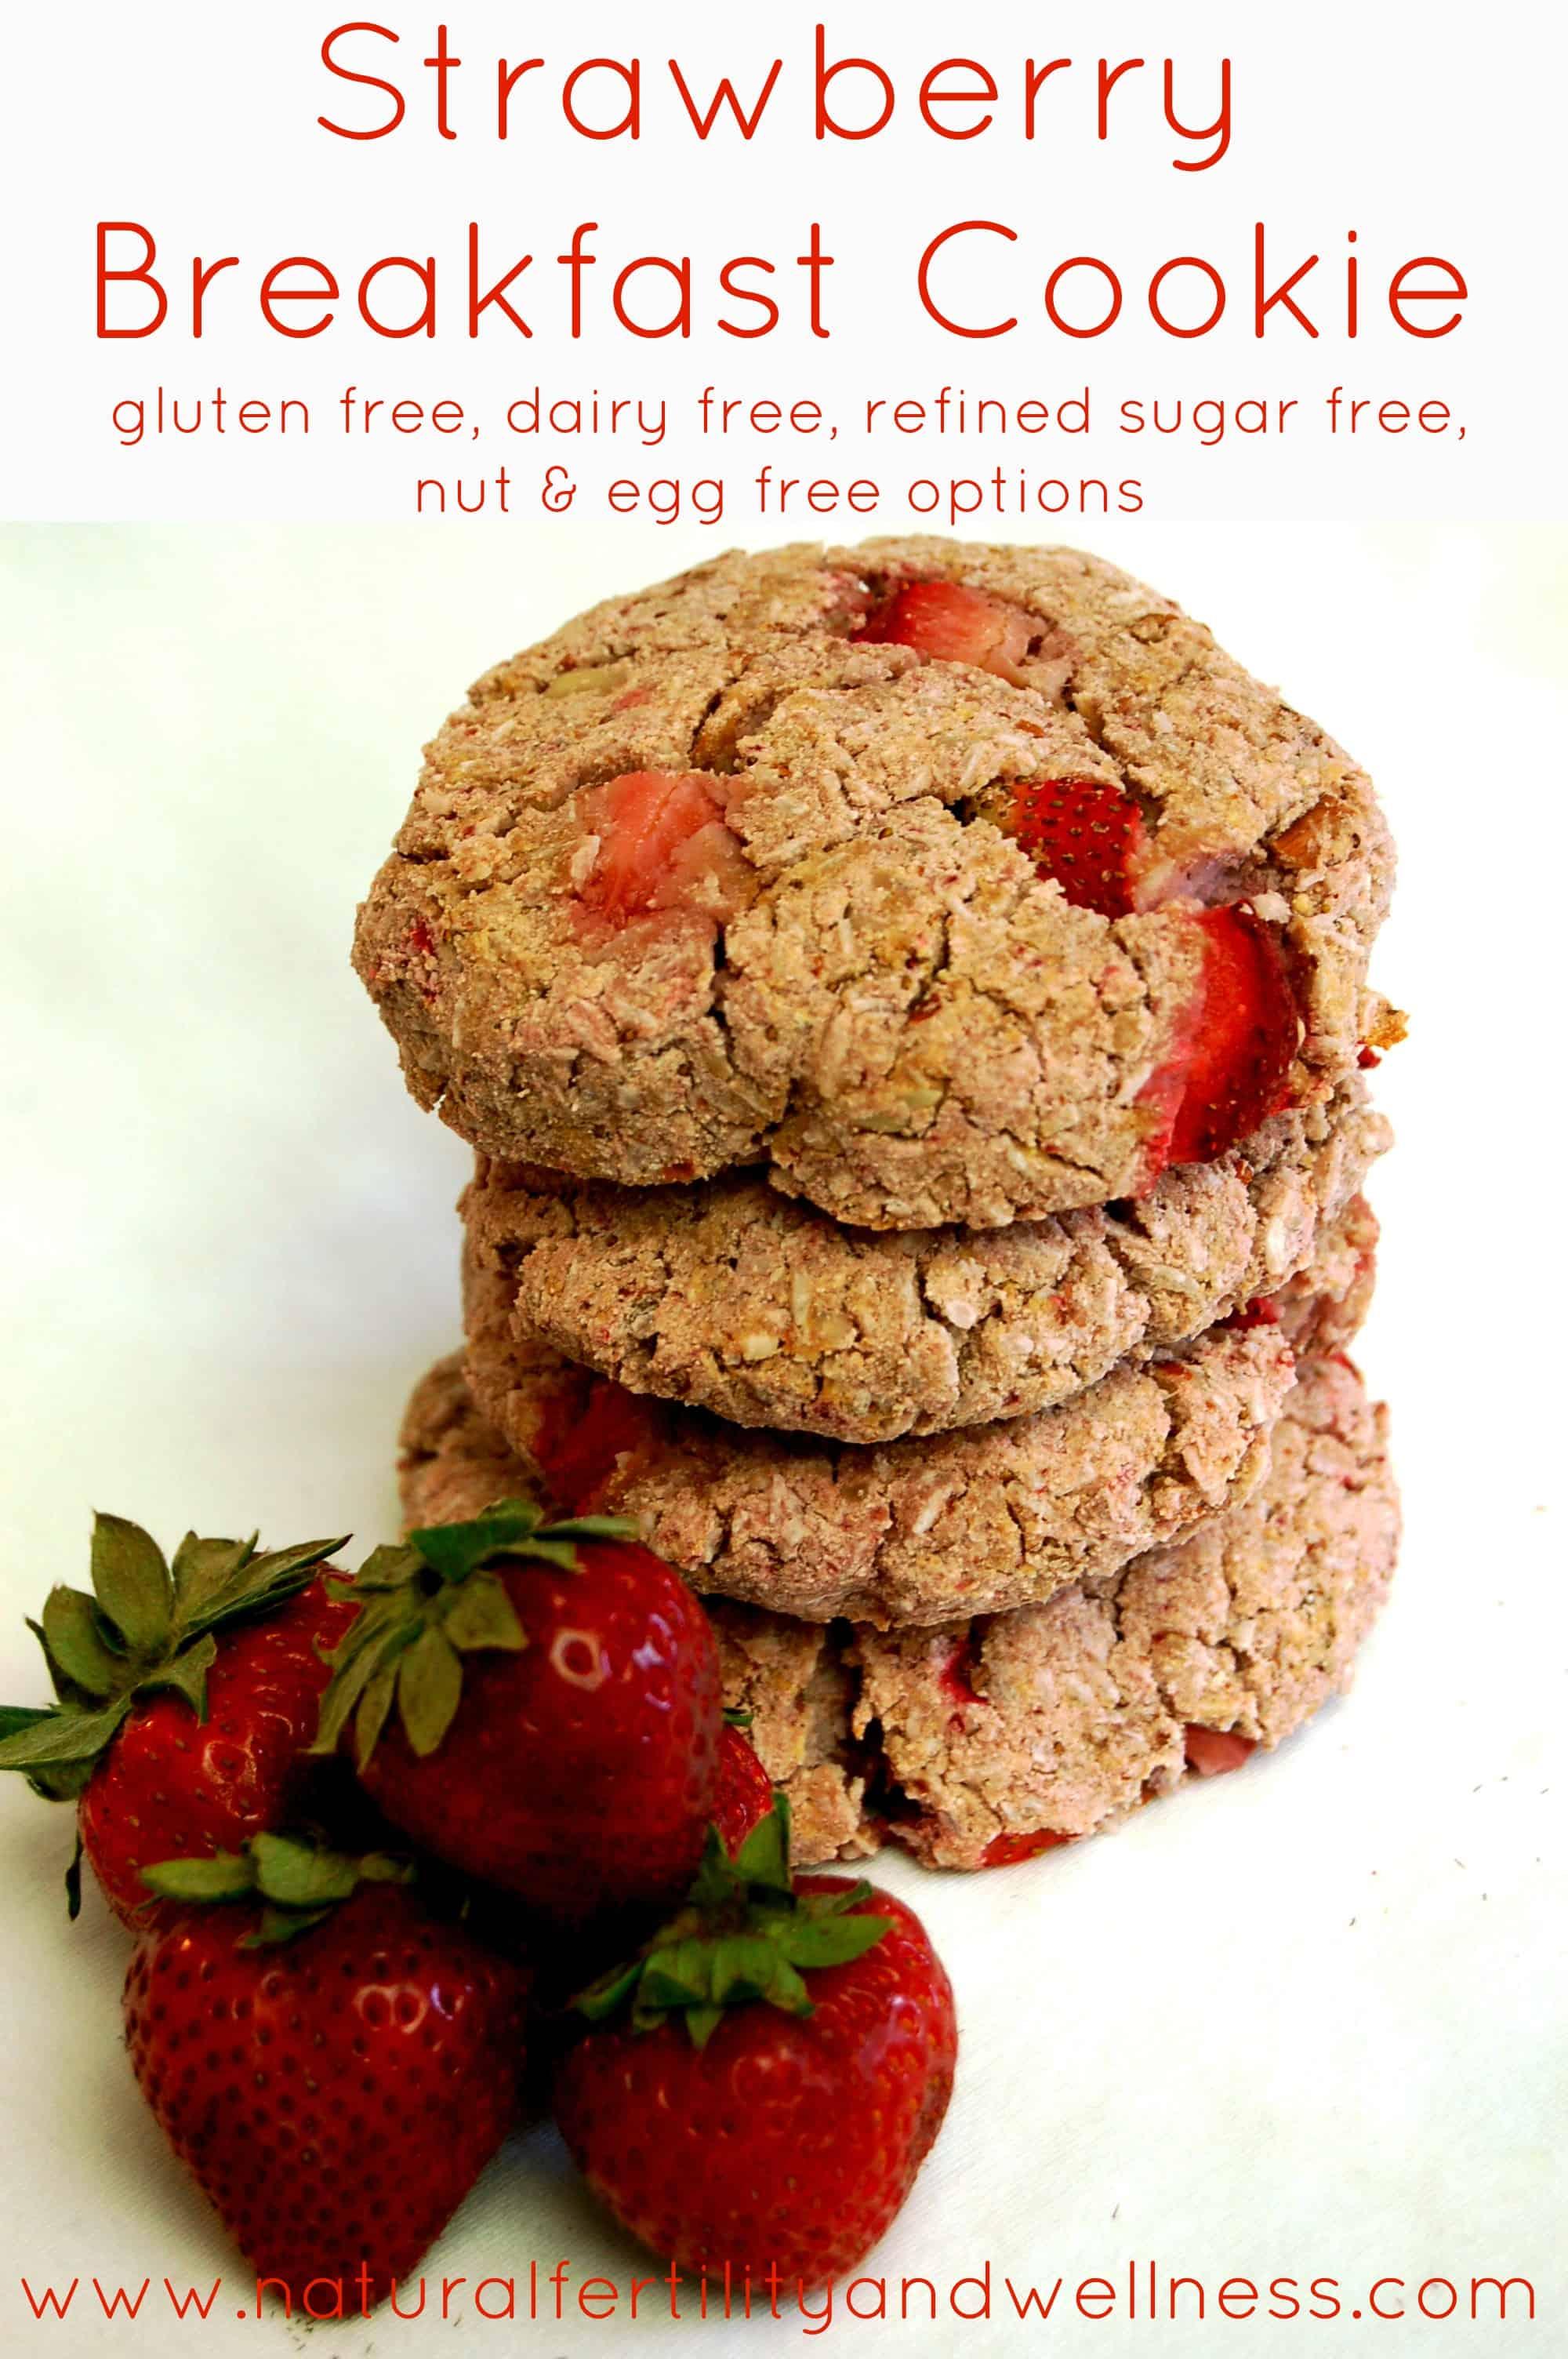 Strawberry Breakfast Cookie